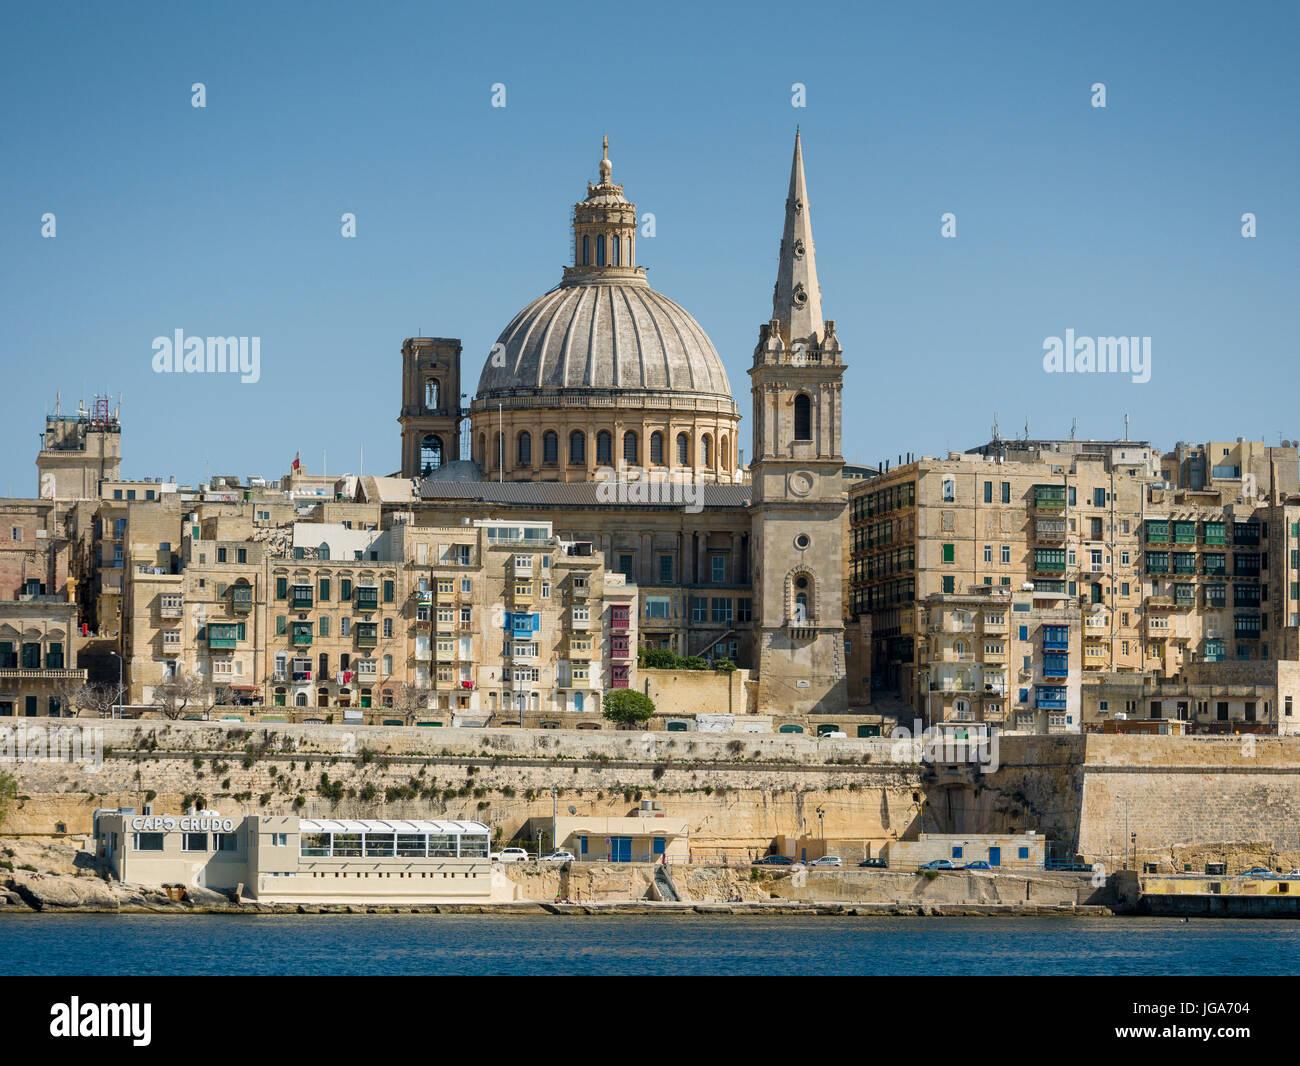 Malta: the Capital Valletta, as seen from the Marsamxett harbour - Stock Image